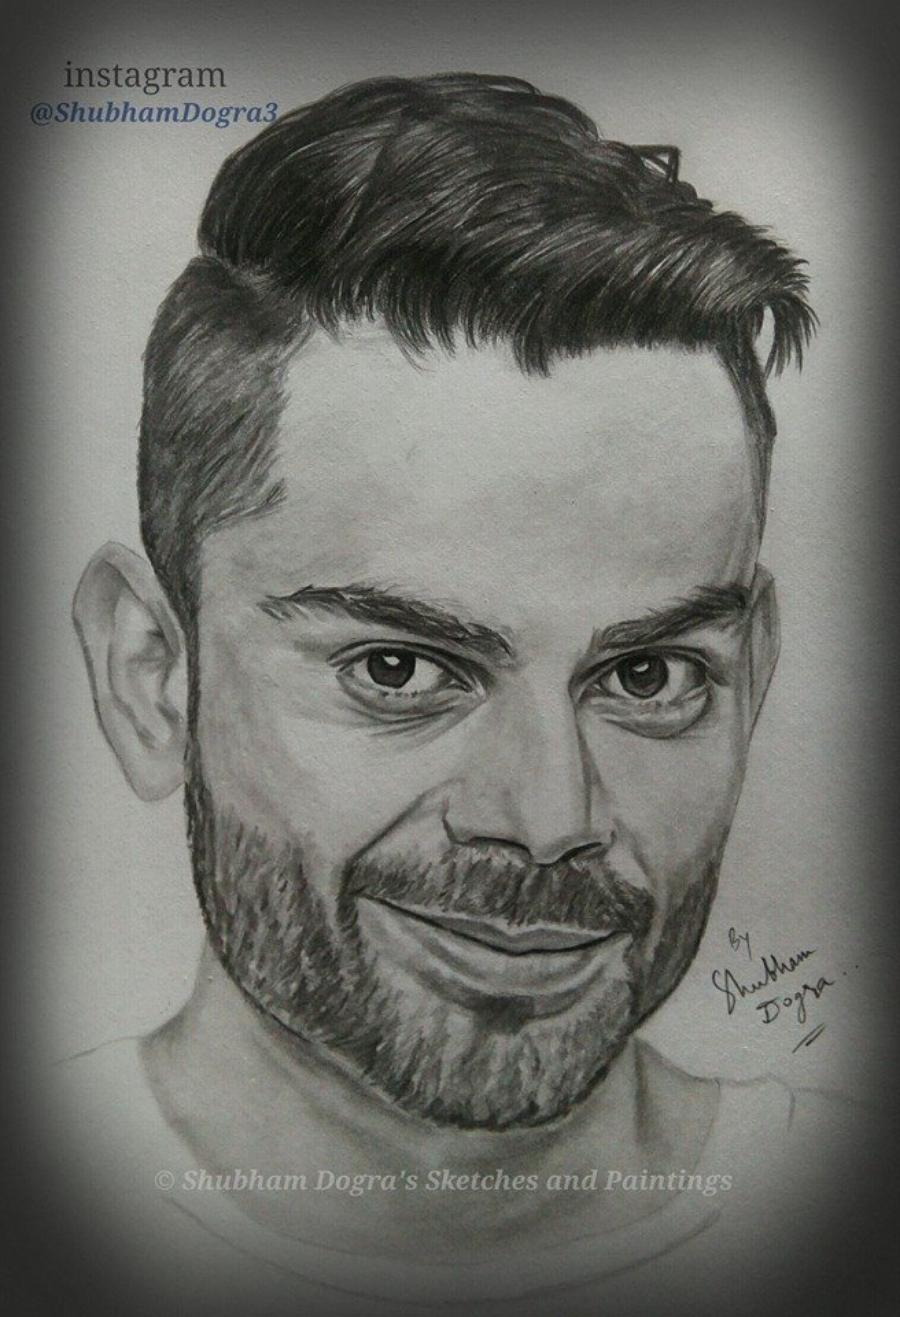 Pencil Sketch Of Virat Kohli | Canvs.in